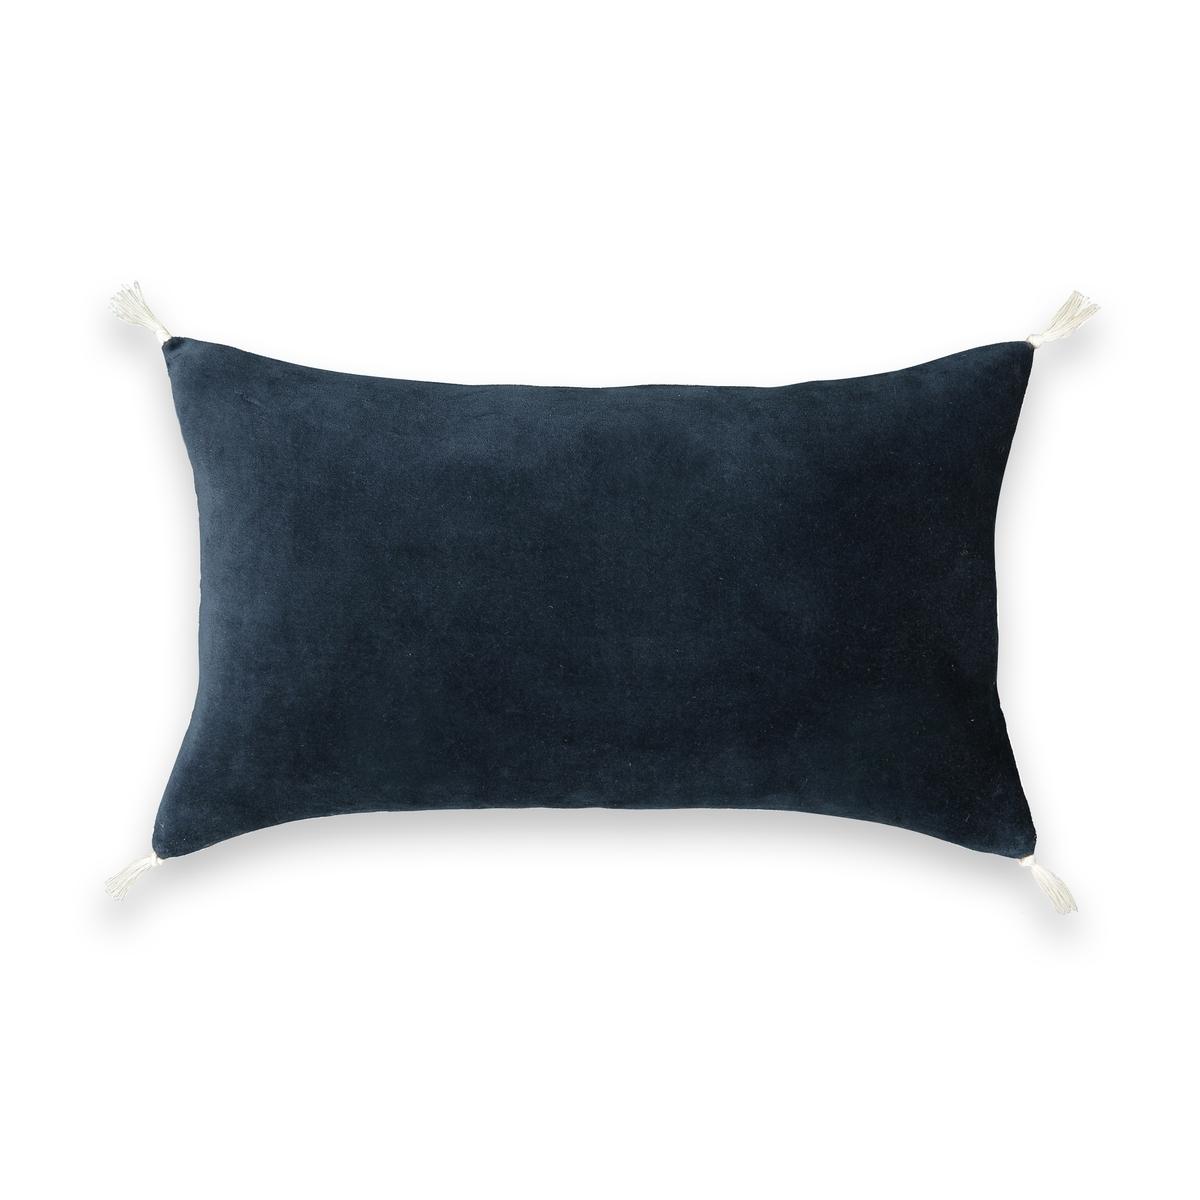 Наволочка La Redoute Из льна и велюра Alicia 50 x 30 см синий покрывало la redoute alicia 130 x 180 см синий